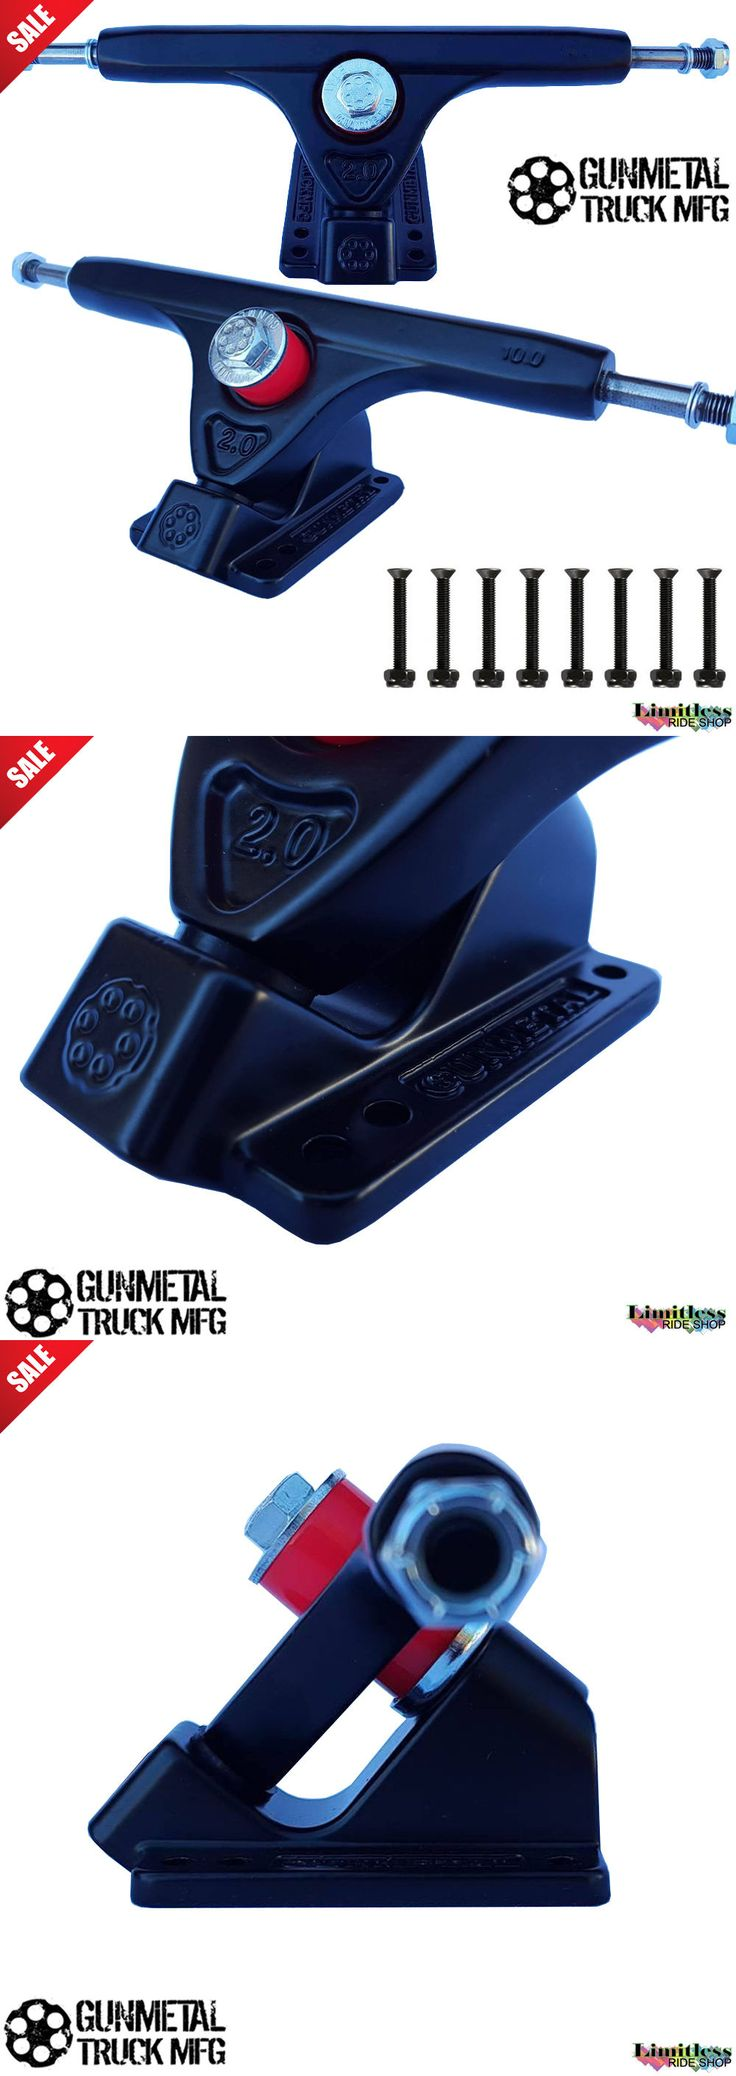 Trucks 165945: Gunmetal Skateboard Longboard Trucks 9 159Mm Set Black 50 Degree New Reverse -> BUY IT NOW ONLY: $34.99 on eBay!